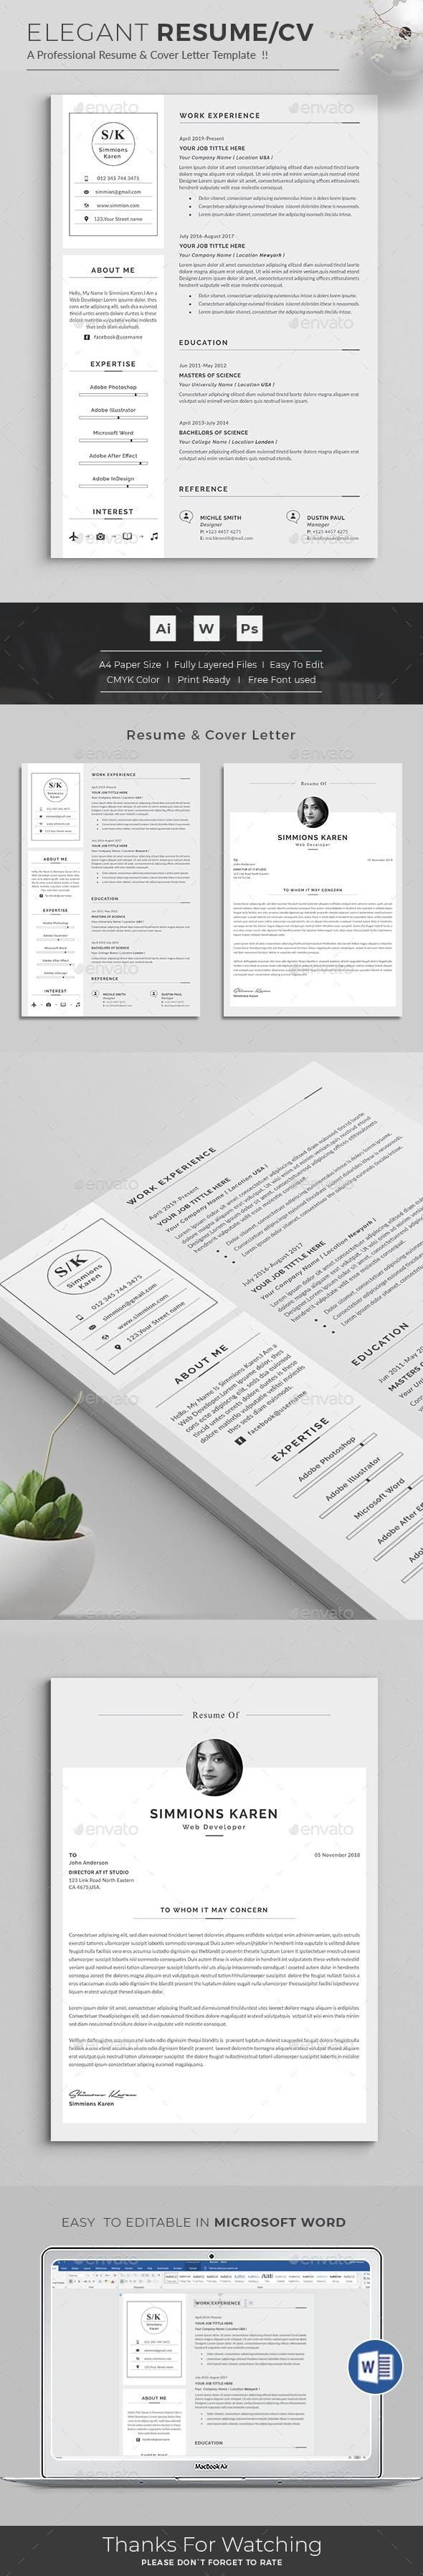 Resume Resume template word, Clean resume template